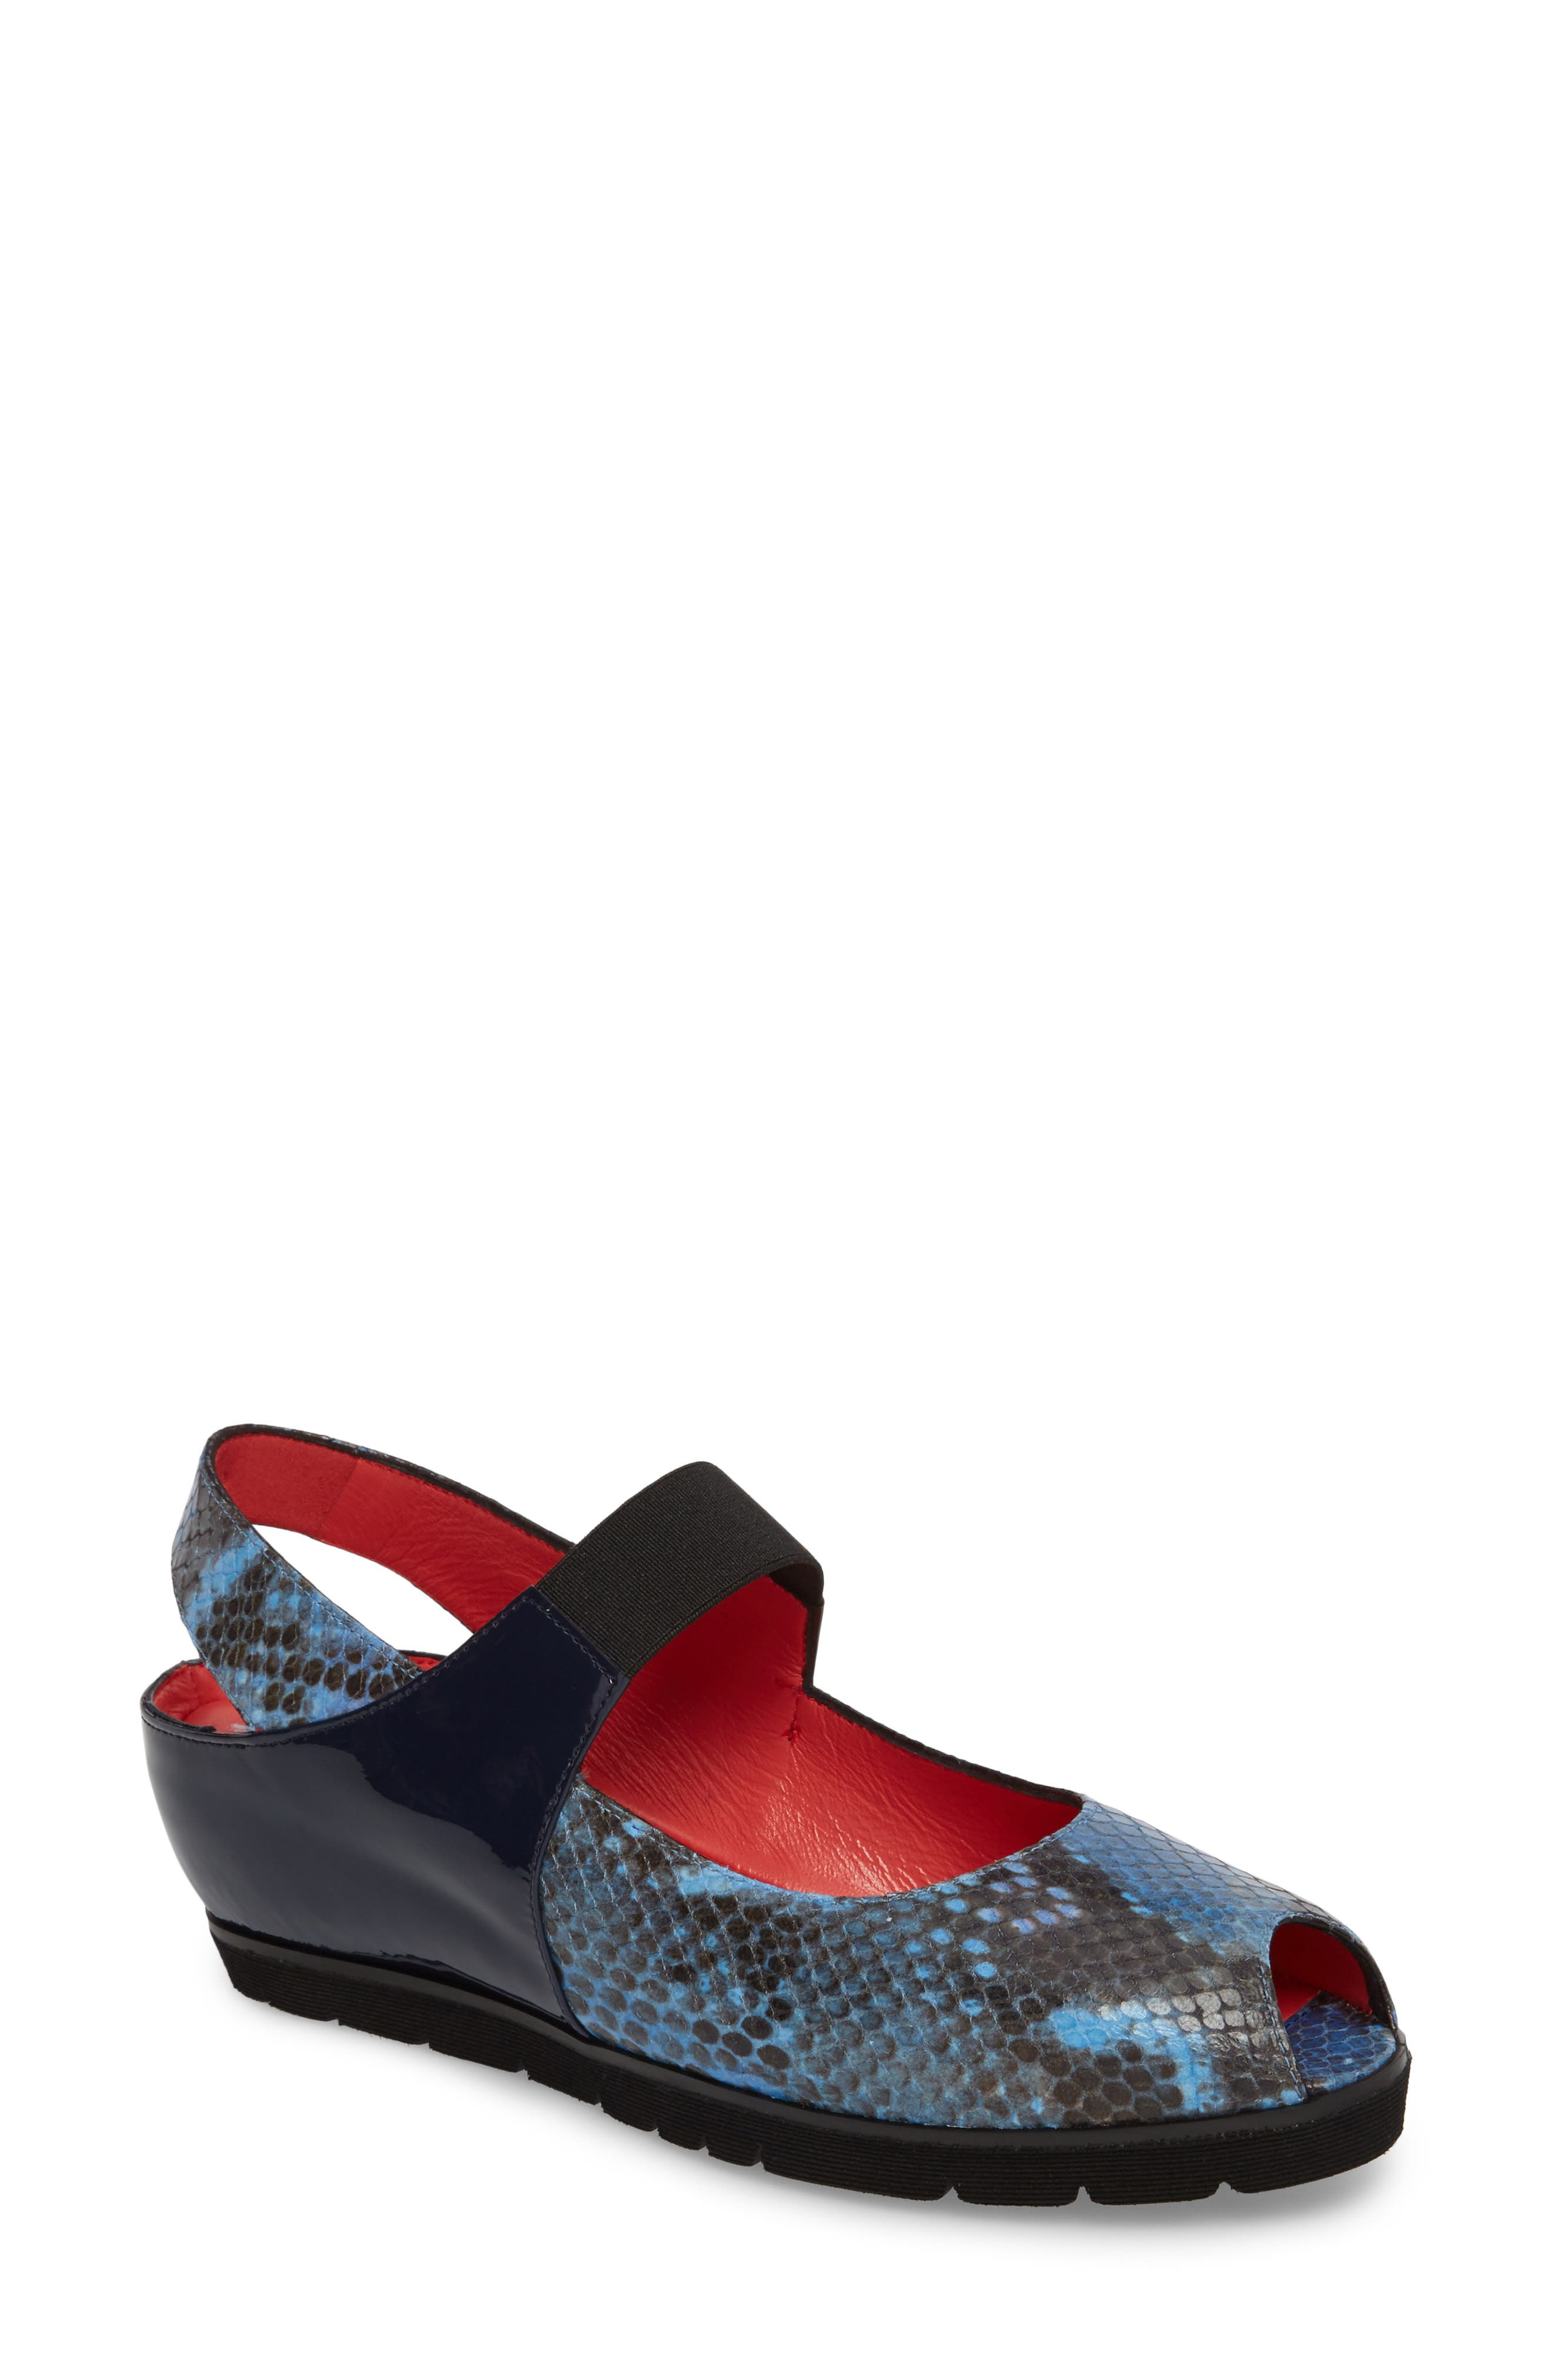 FOOTWEAR - Sandals Pas De Rouge Yrk15